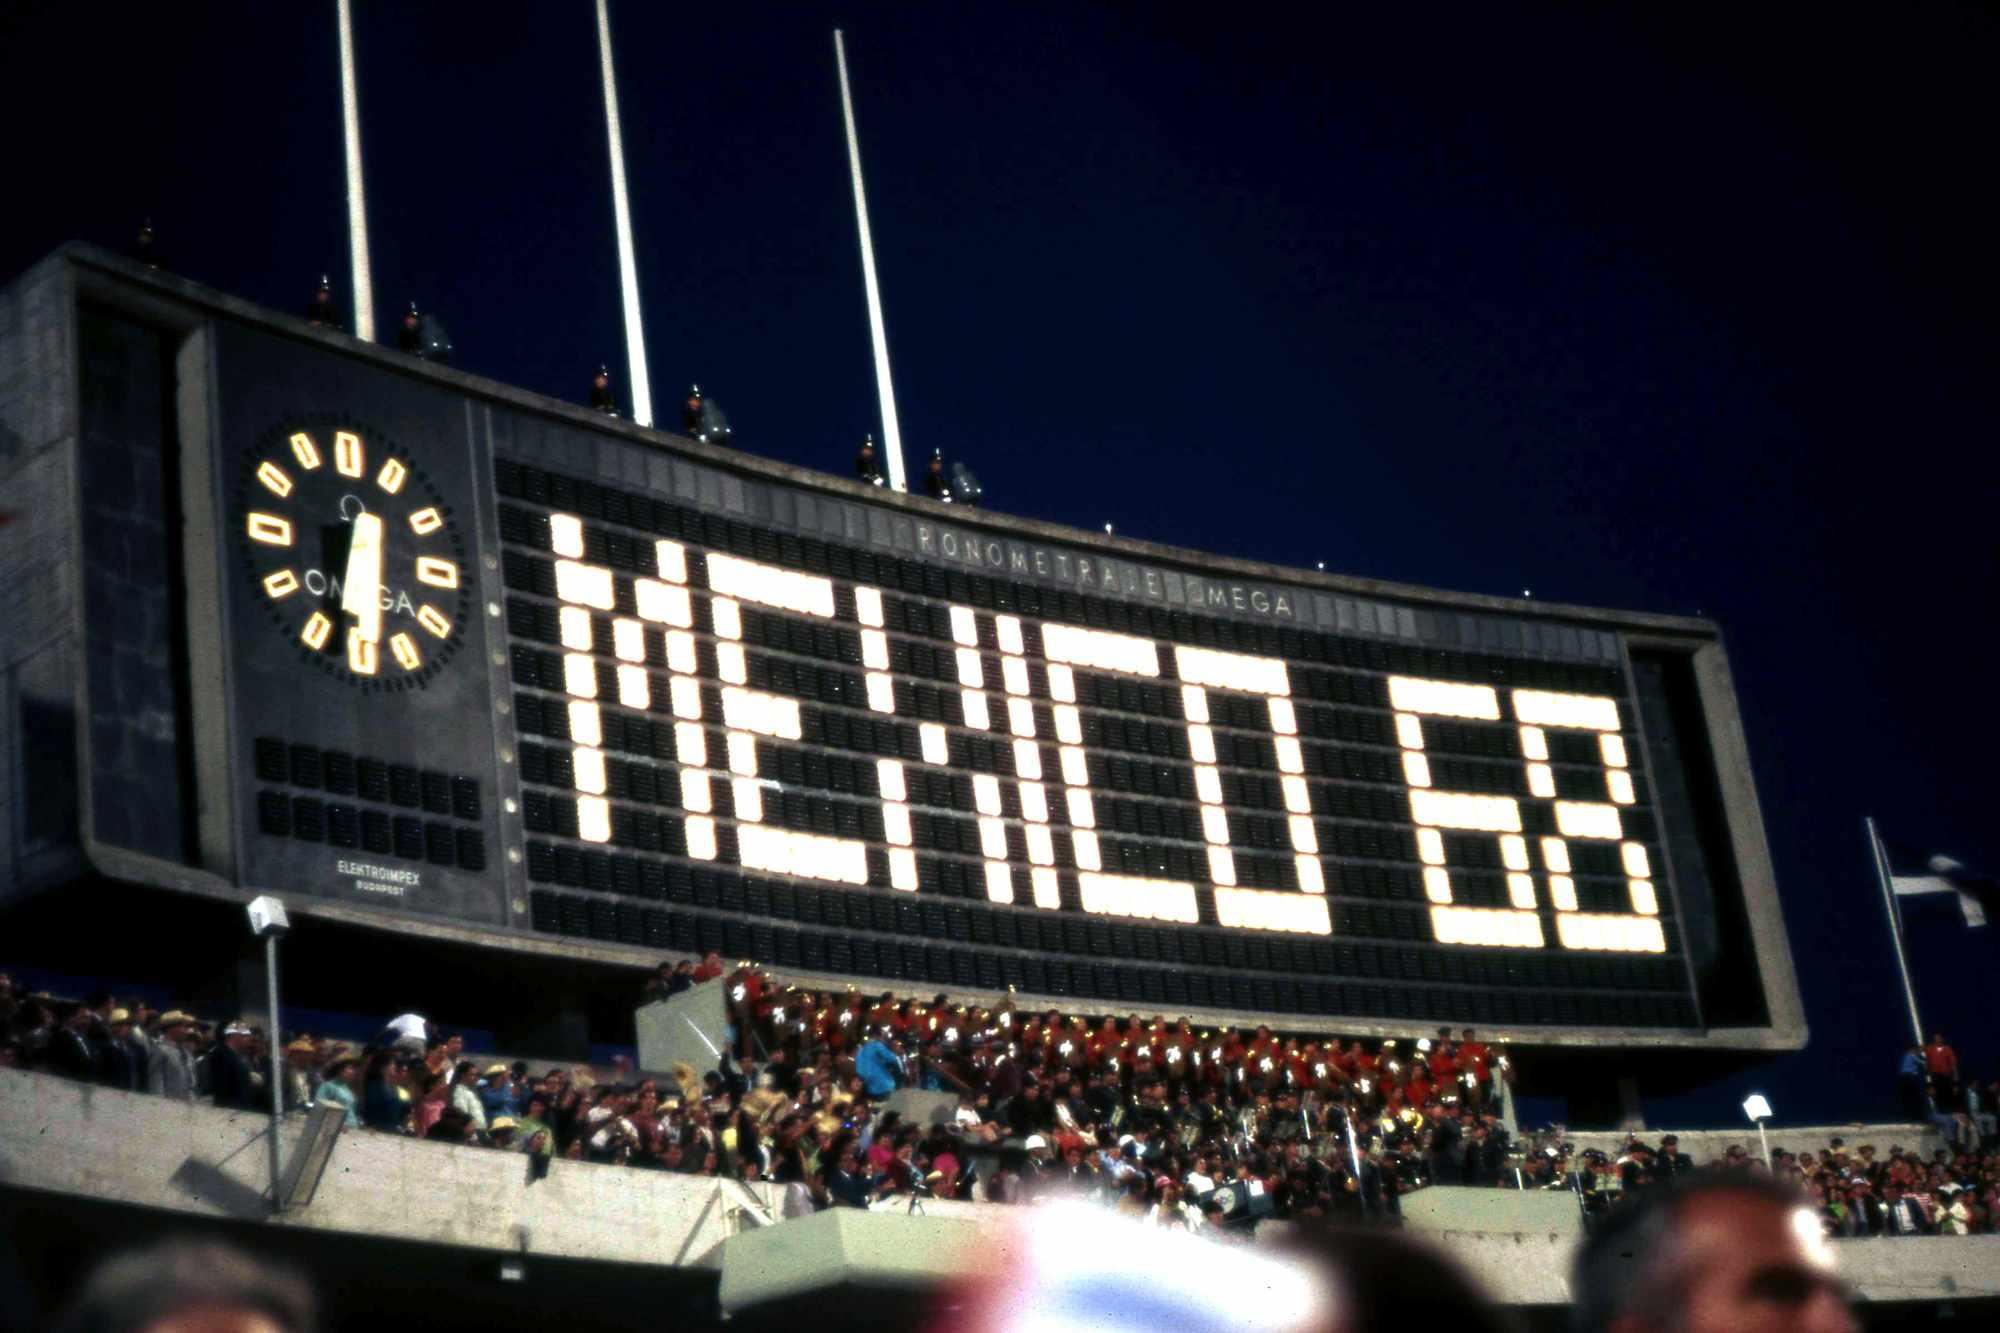 Closing of the 1968 Summer Olympic Games at the Estadio Olímpico Universitario in Mexico City